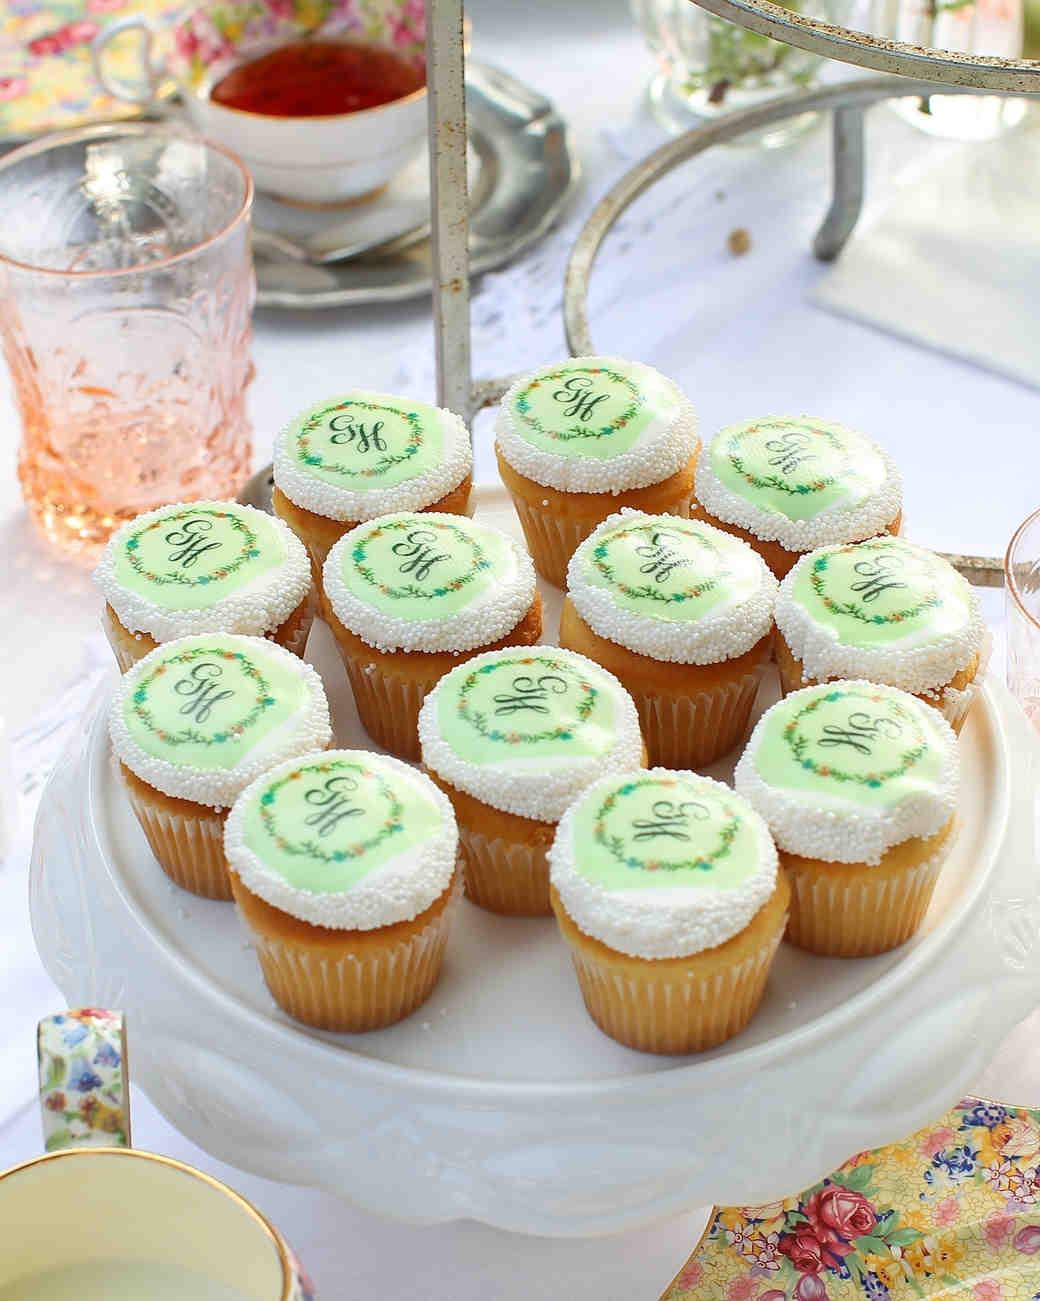 geri-hirsch-bridal-shower-tea-party-cupcakes-0315.jpg